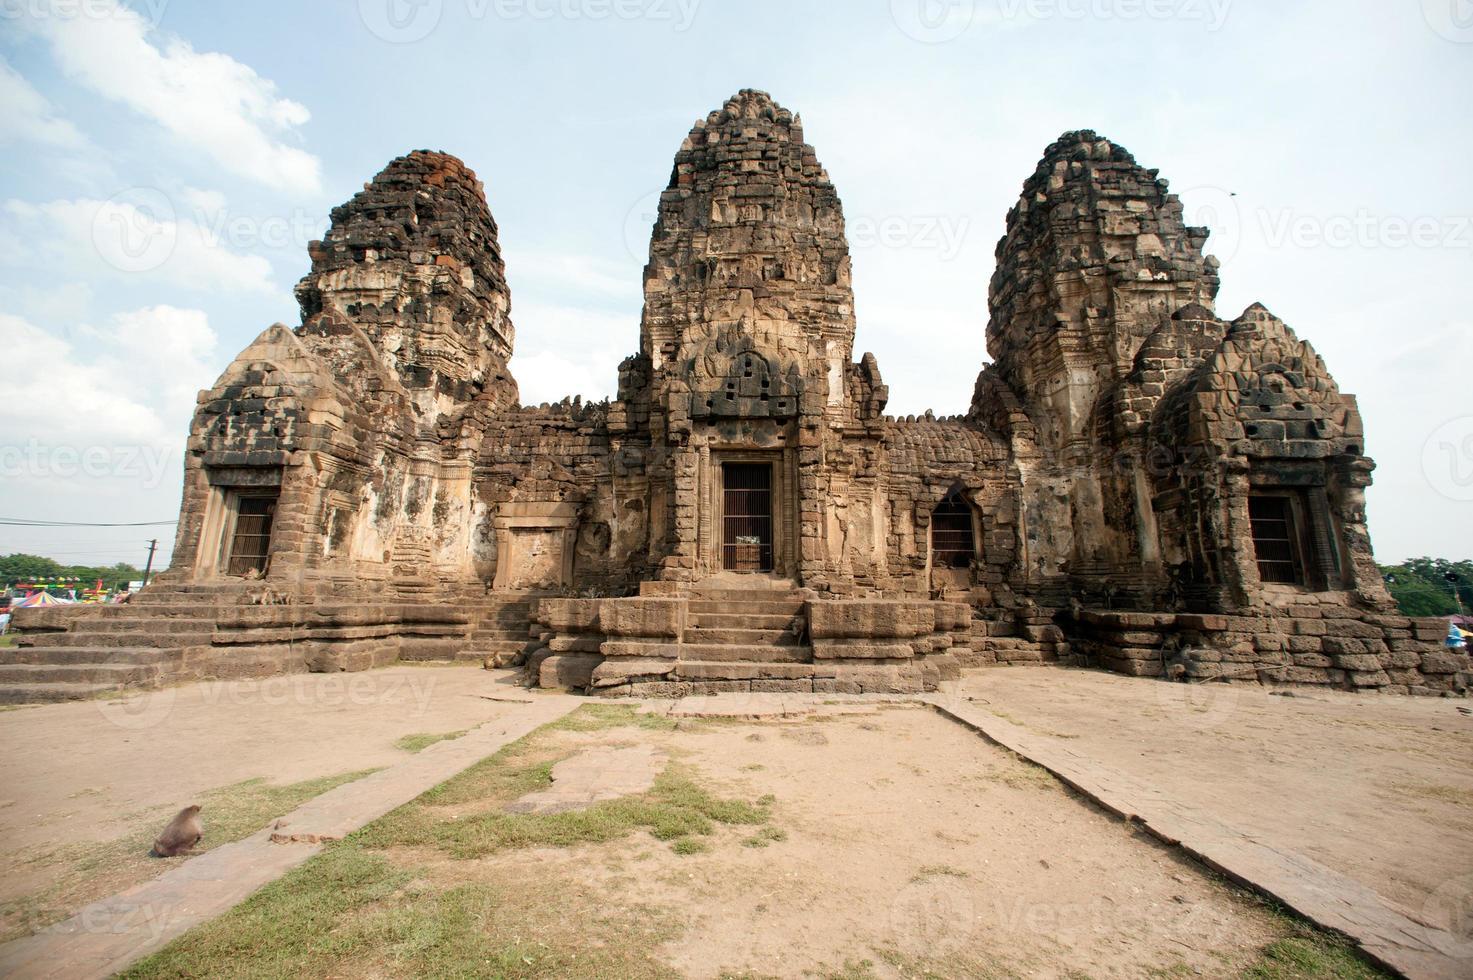 phra prang sam yod tempel in Thailand. foto